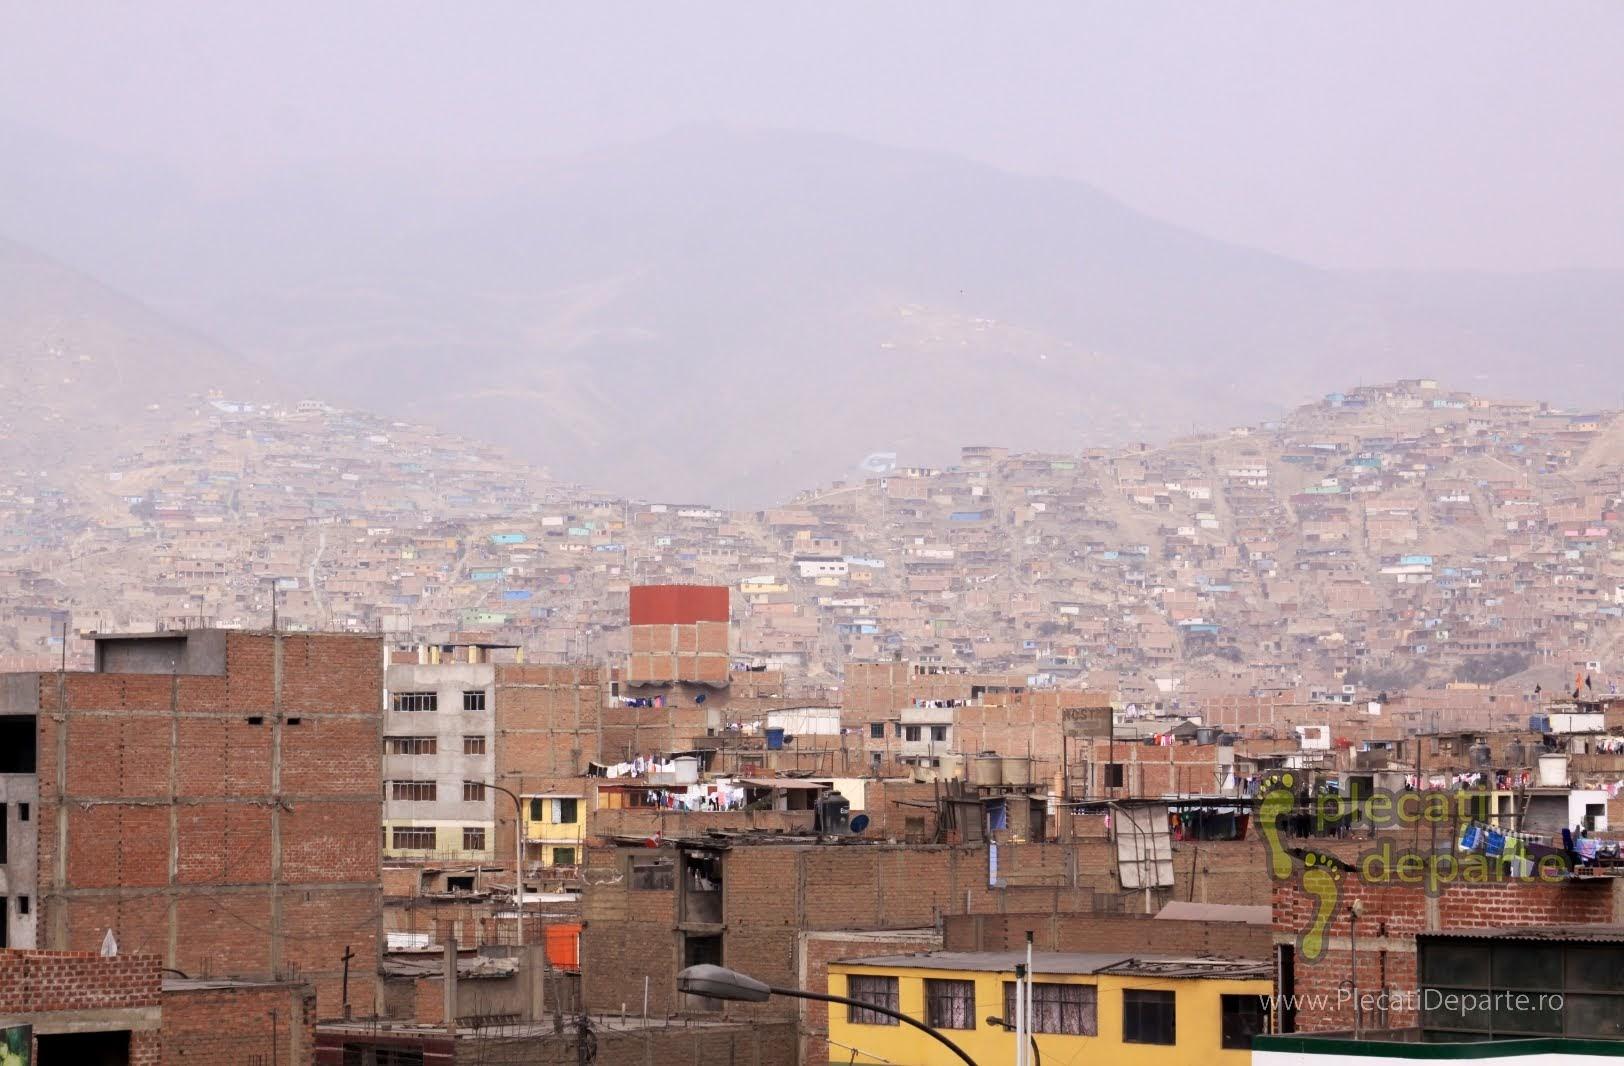 case din caramida, ca si favelas, in cartierul San Juan de Lurigancho, Lima, Peru